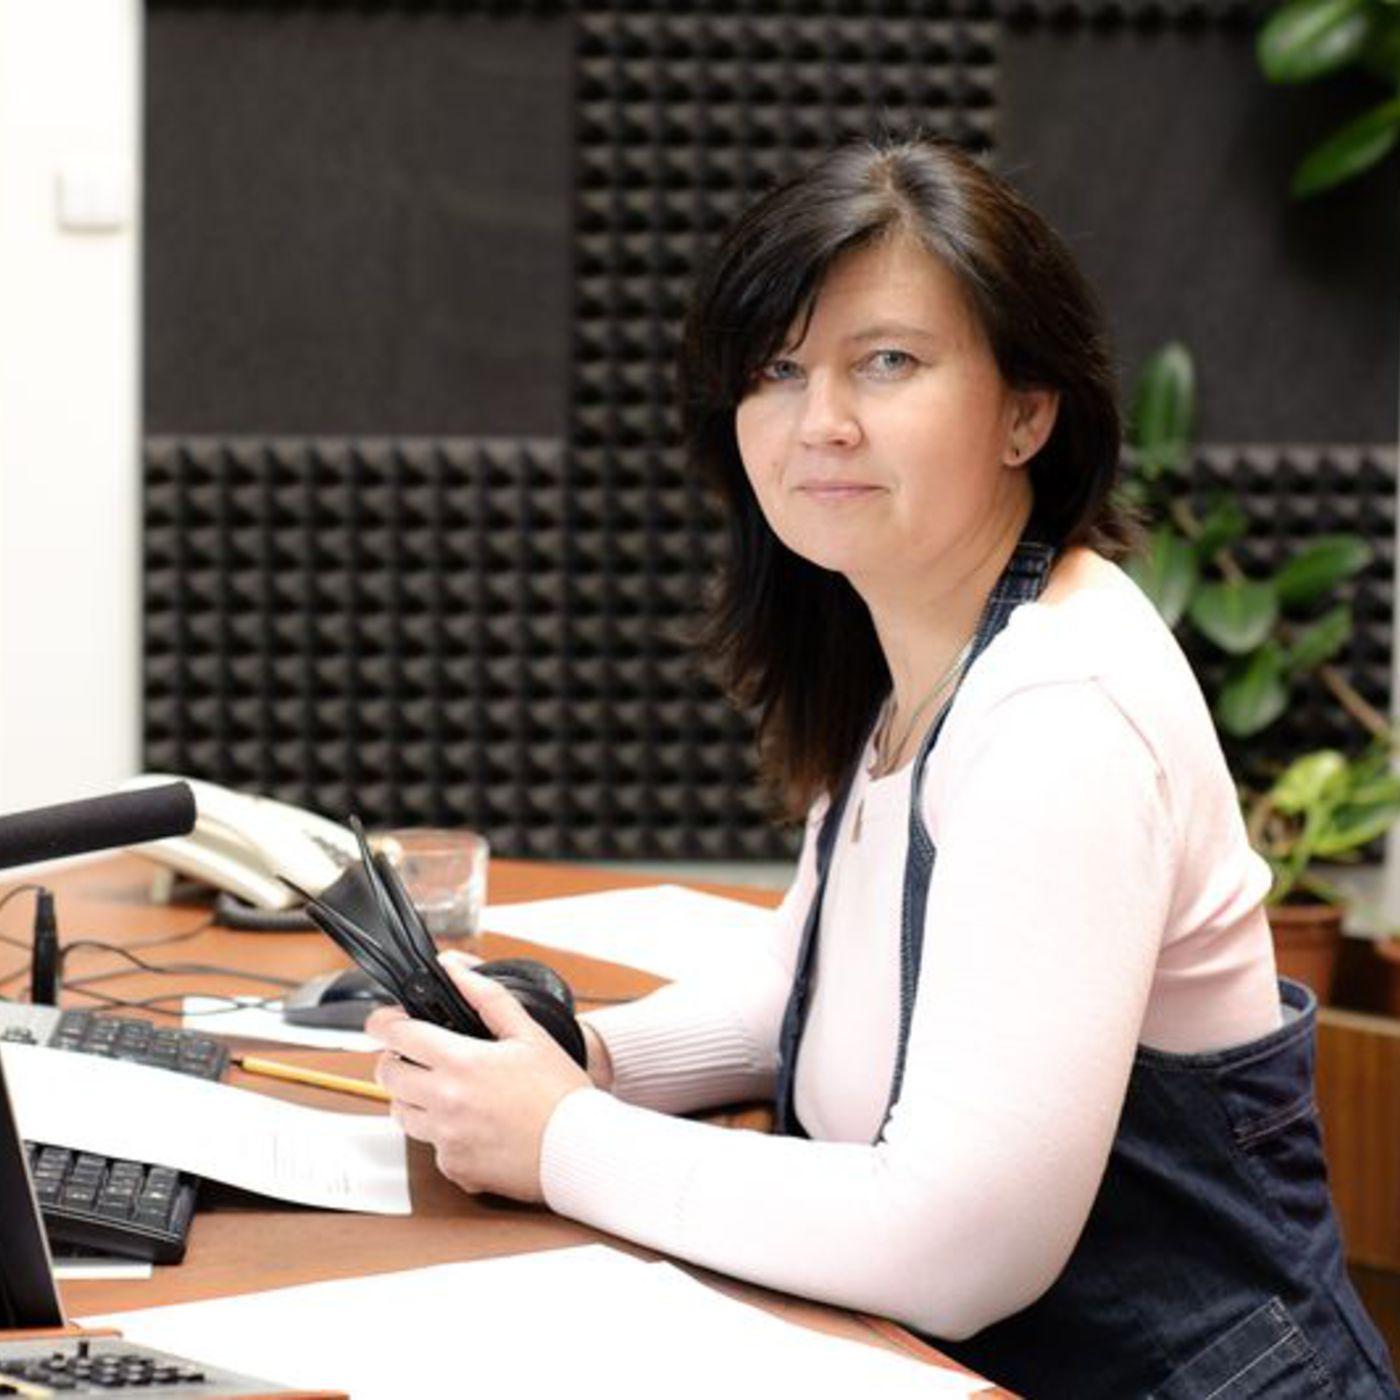 Eva Kadlčáková: My dva